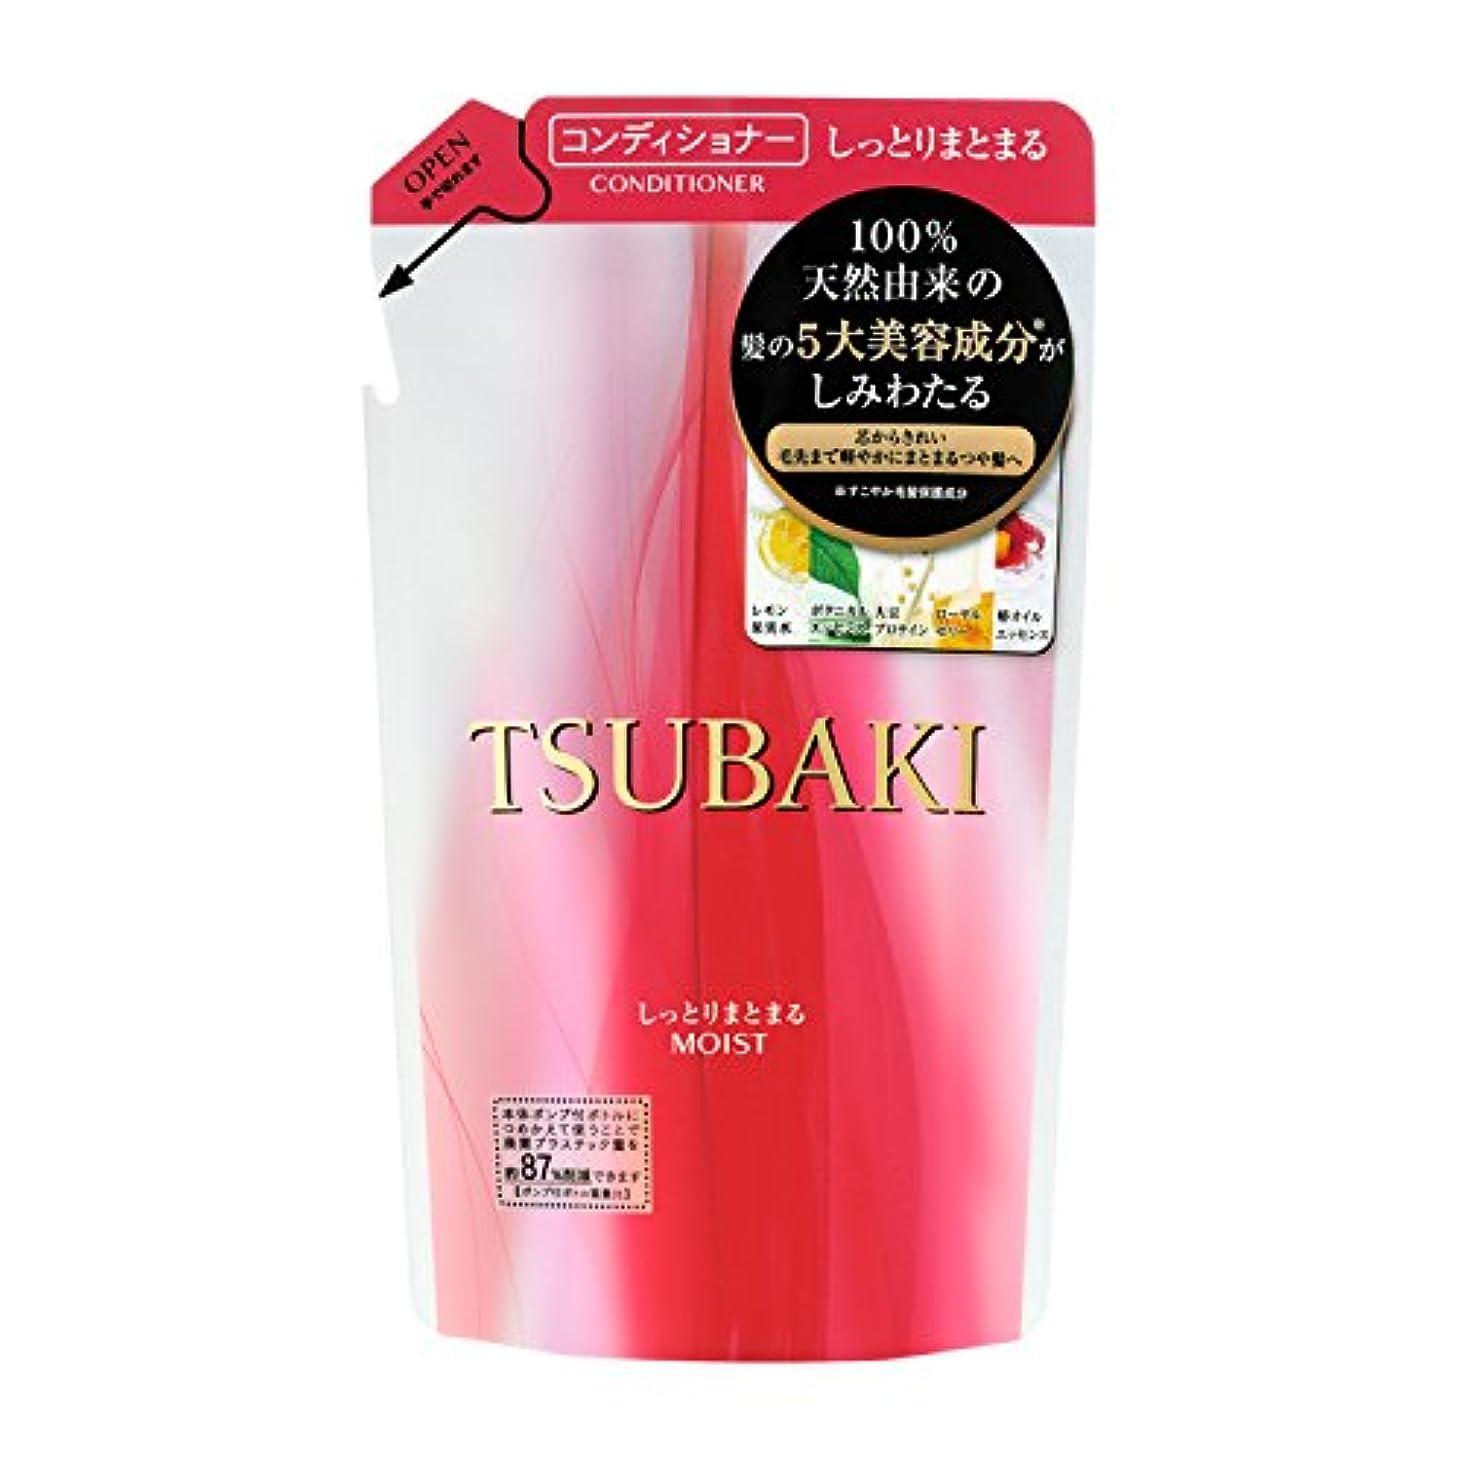 TSUBAKI しっとりまとまる ヘアコンディショナー つめかえ用 330mL